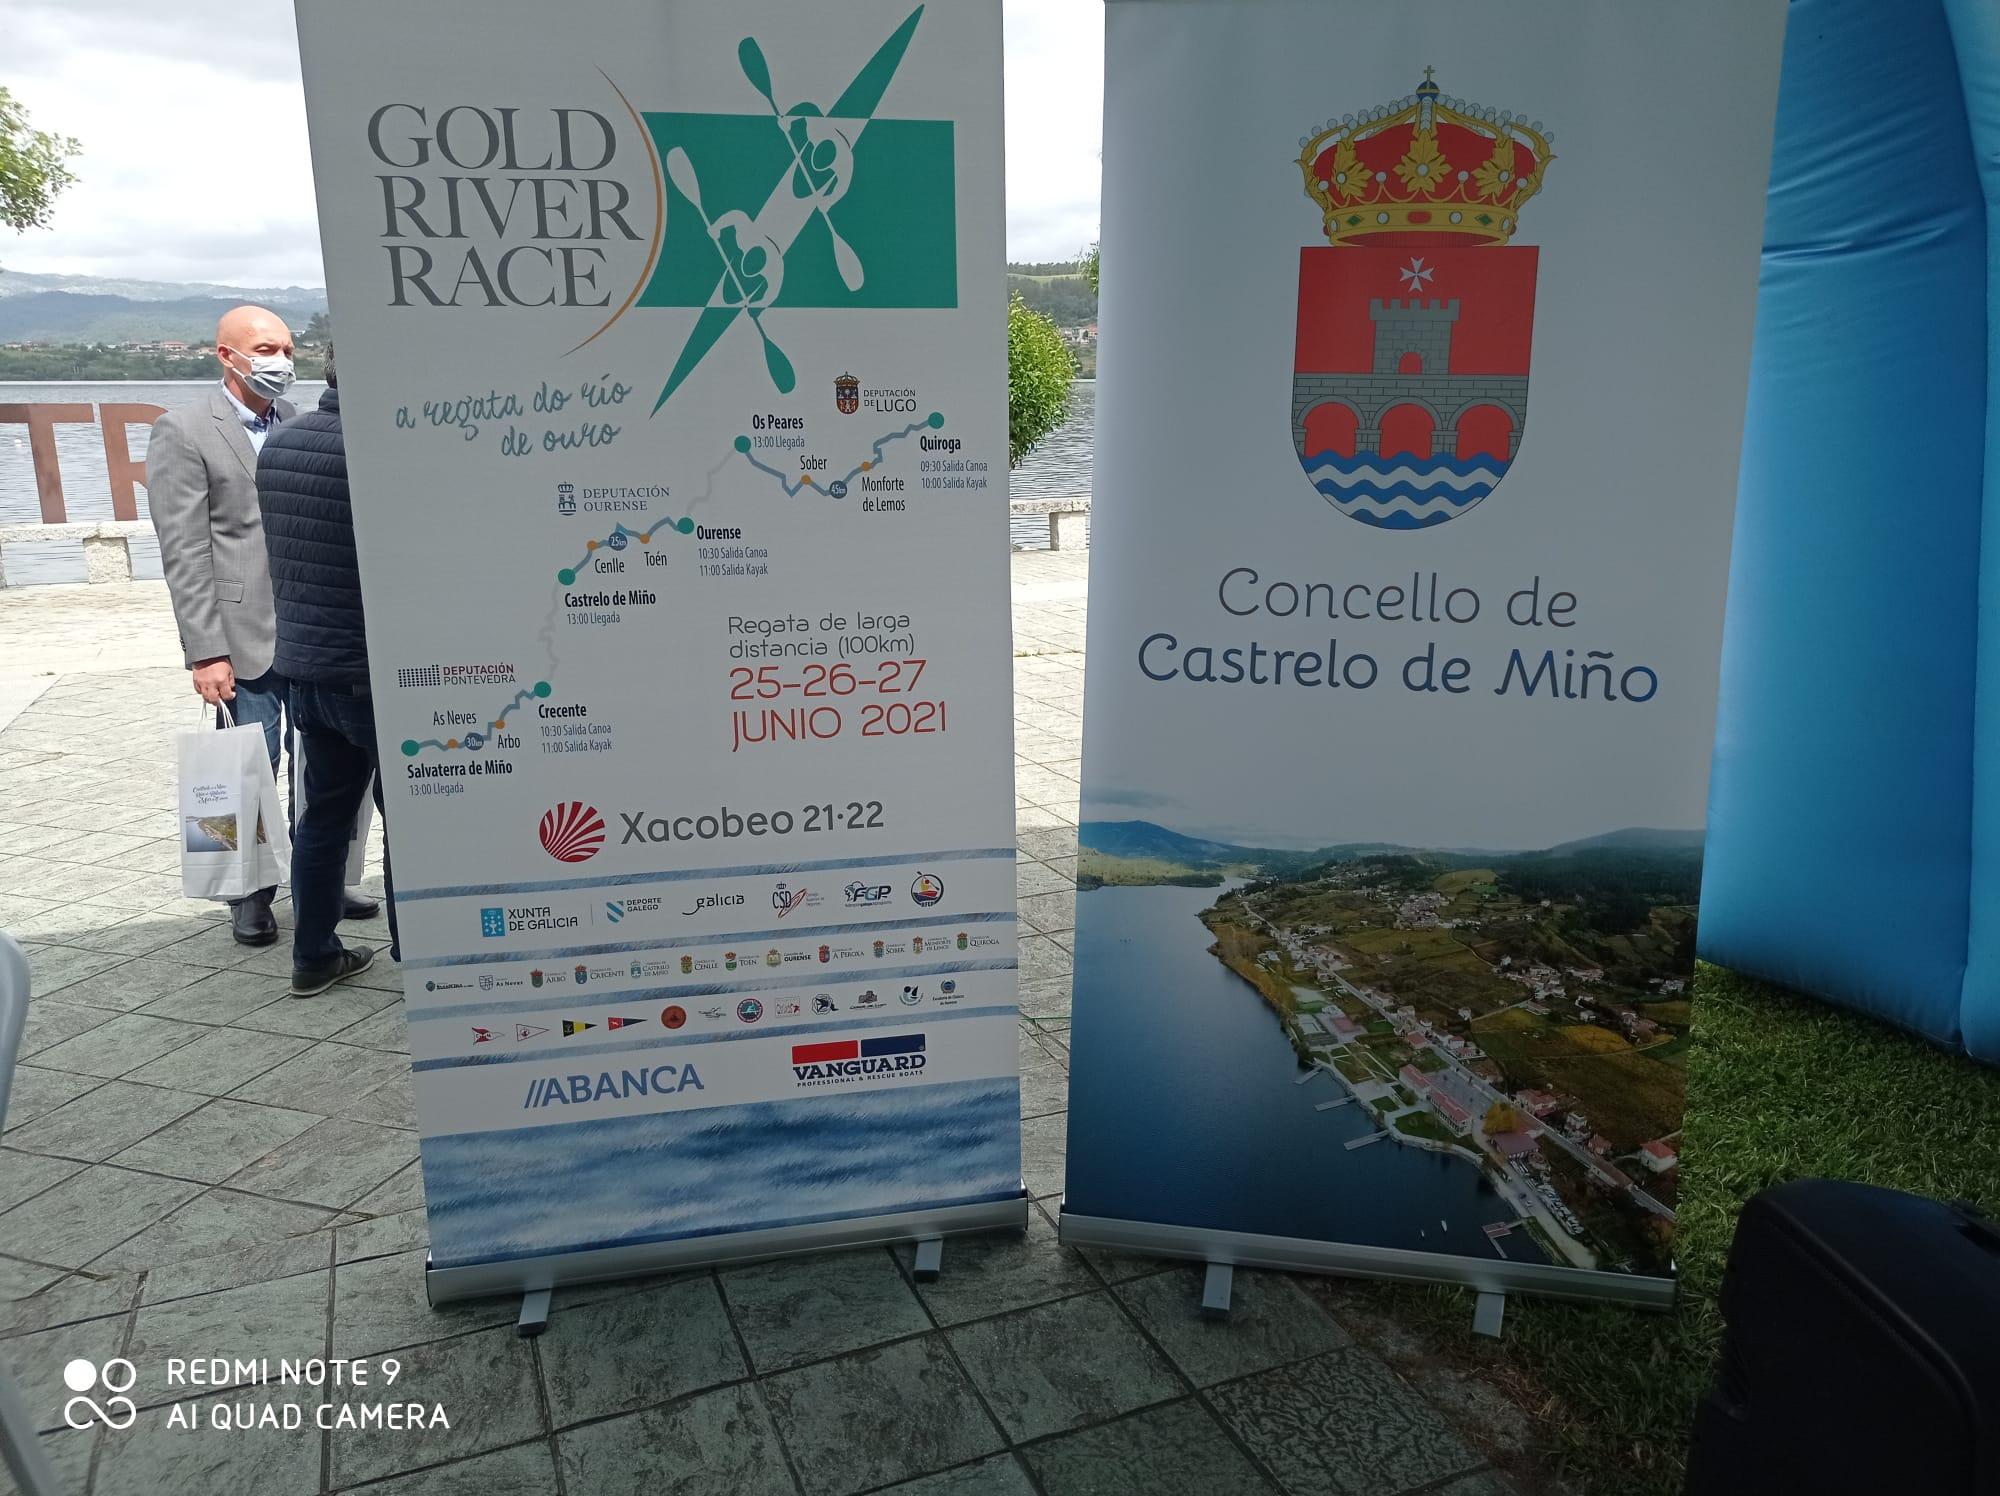 Gold River Race